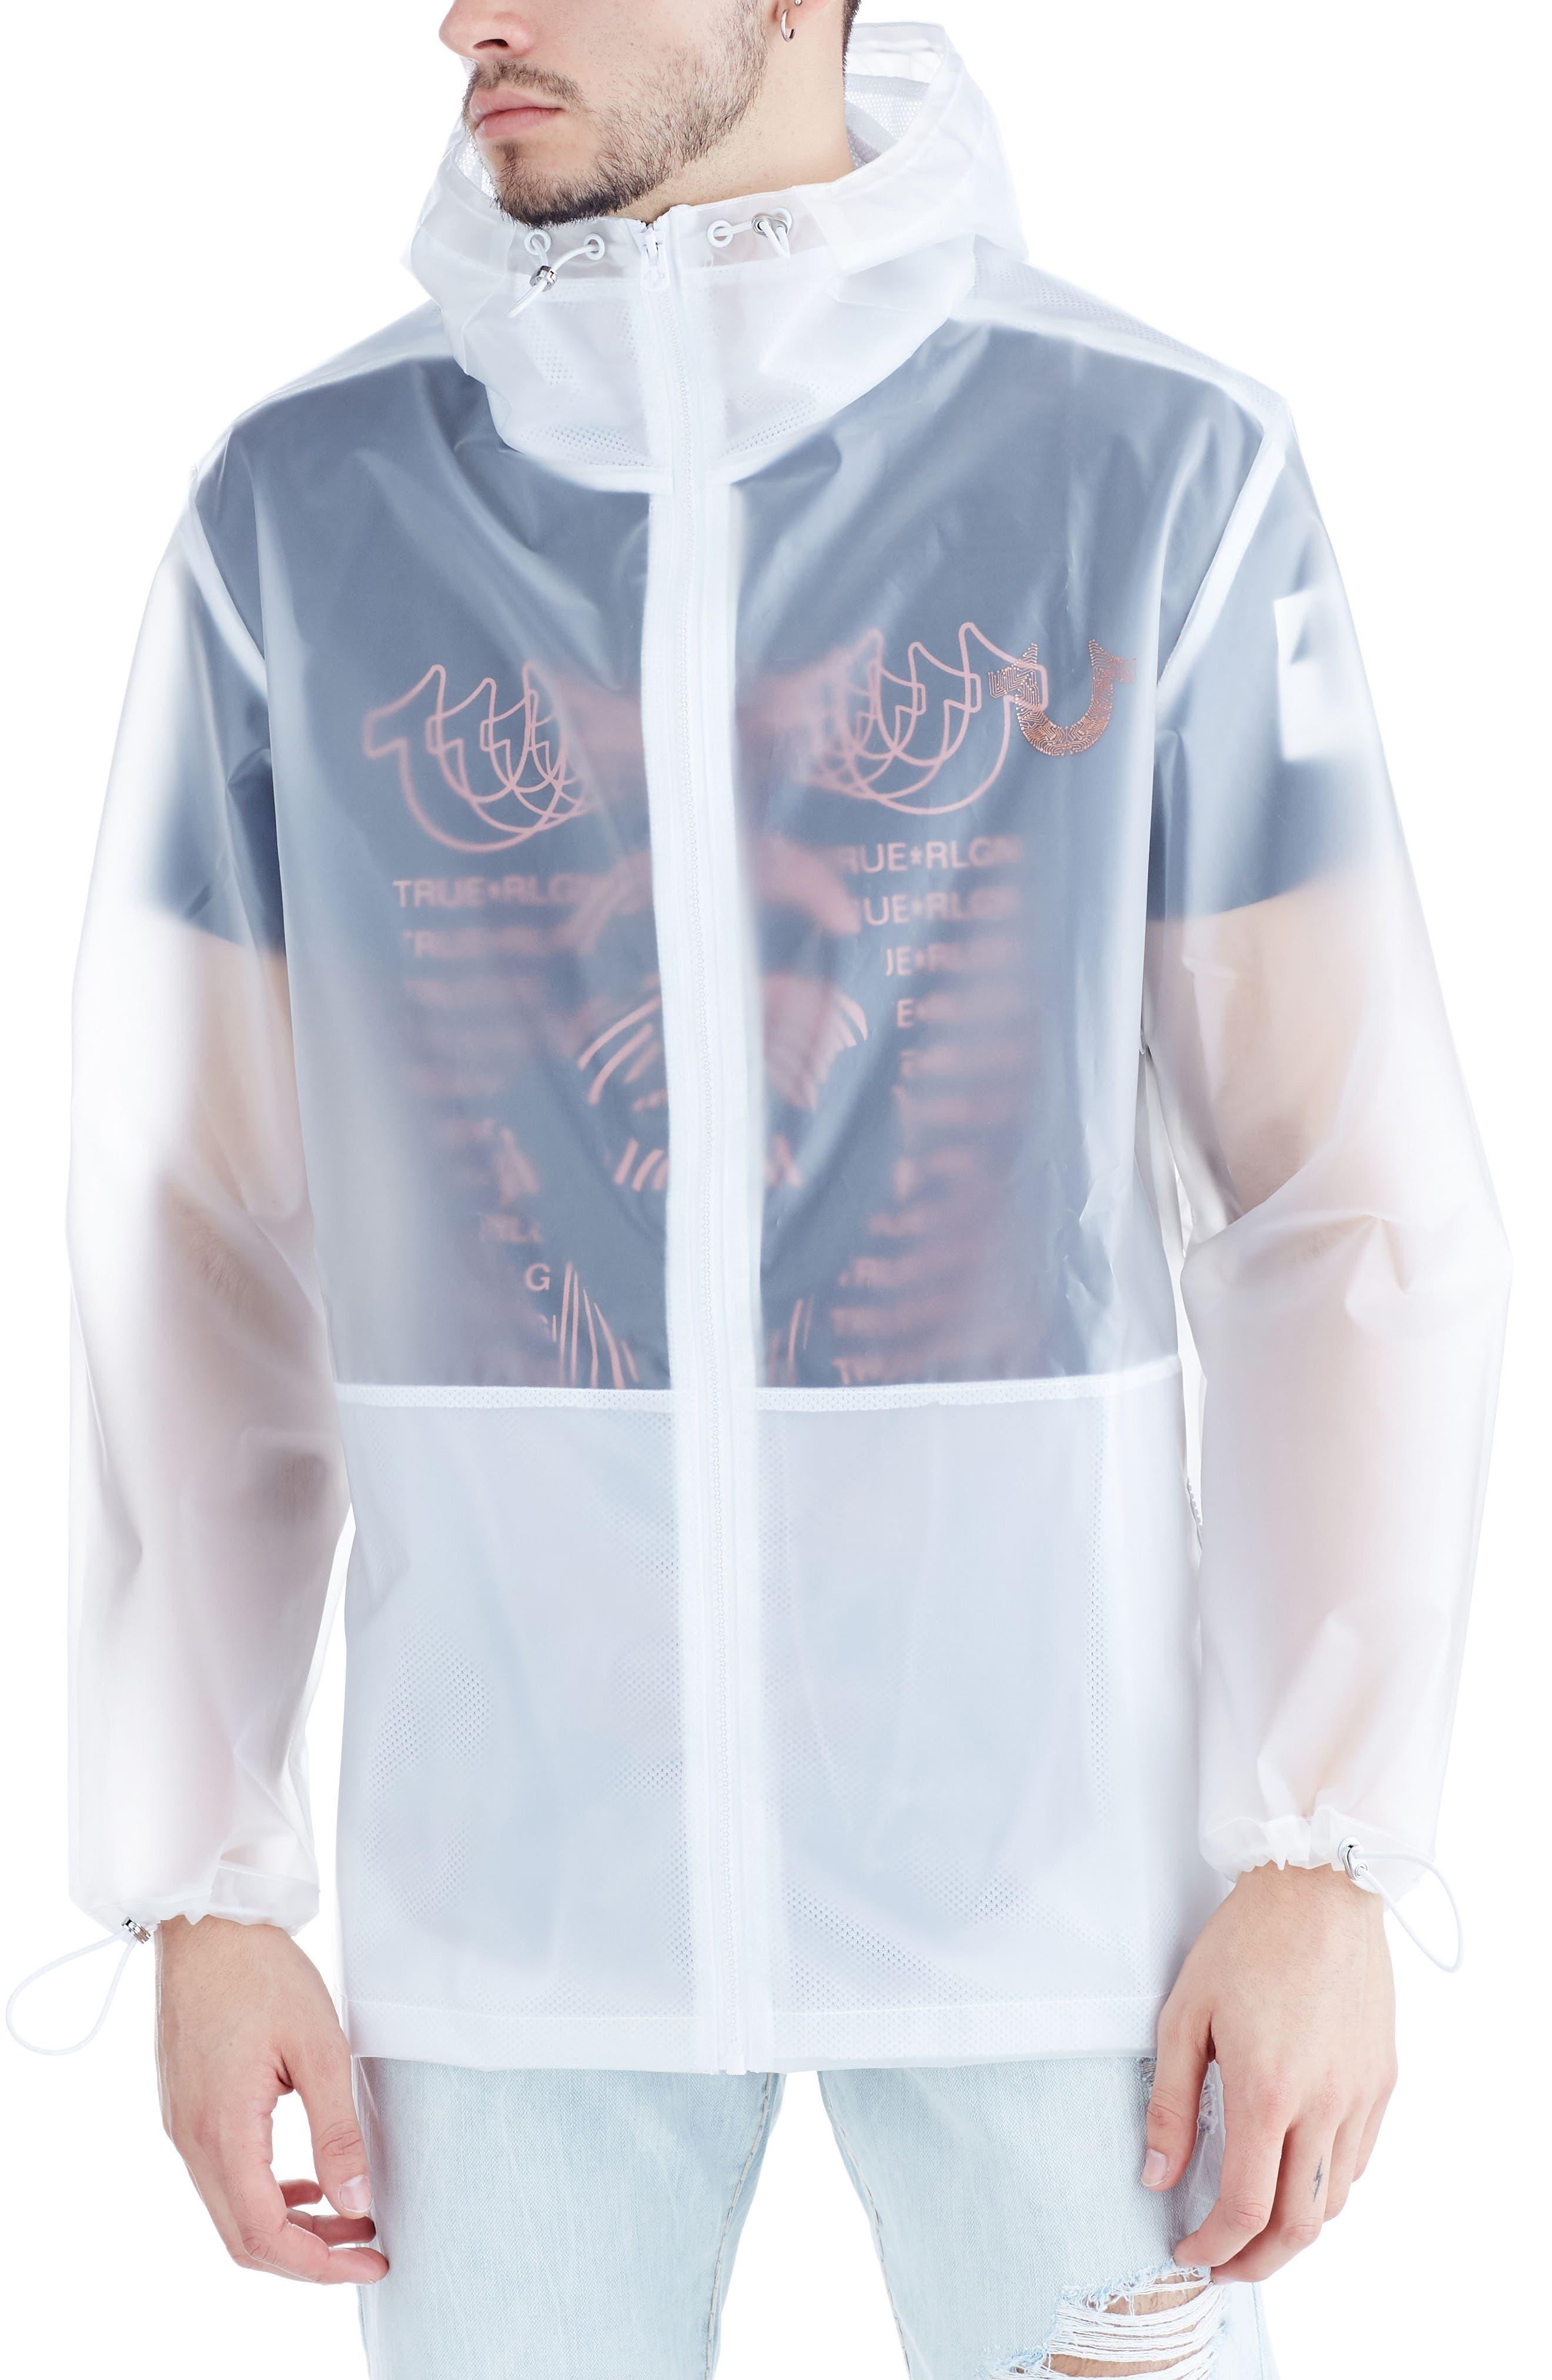 Main Image - True Religion Brand Jeans Translucent Rain Jacket